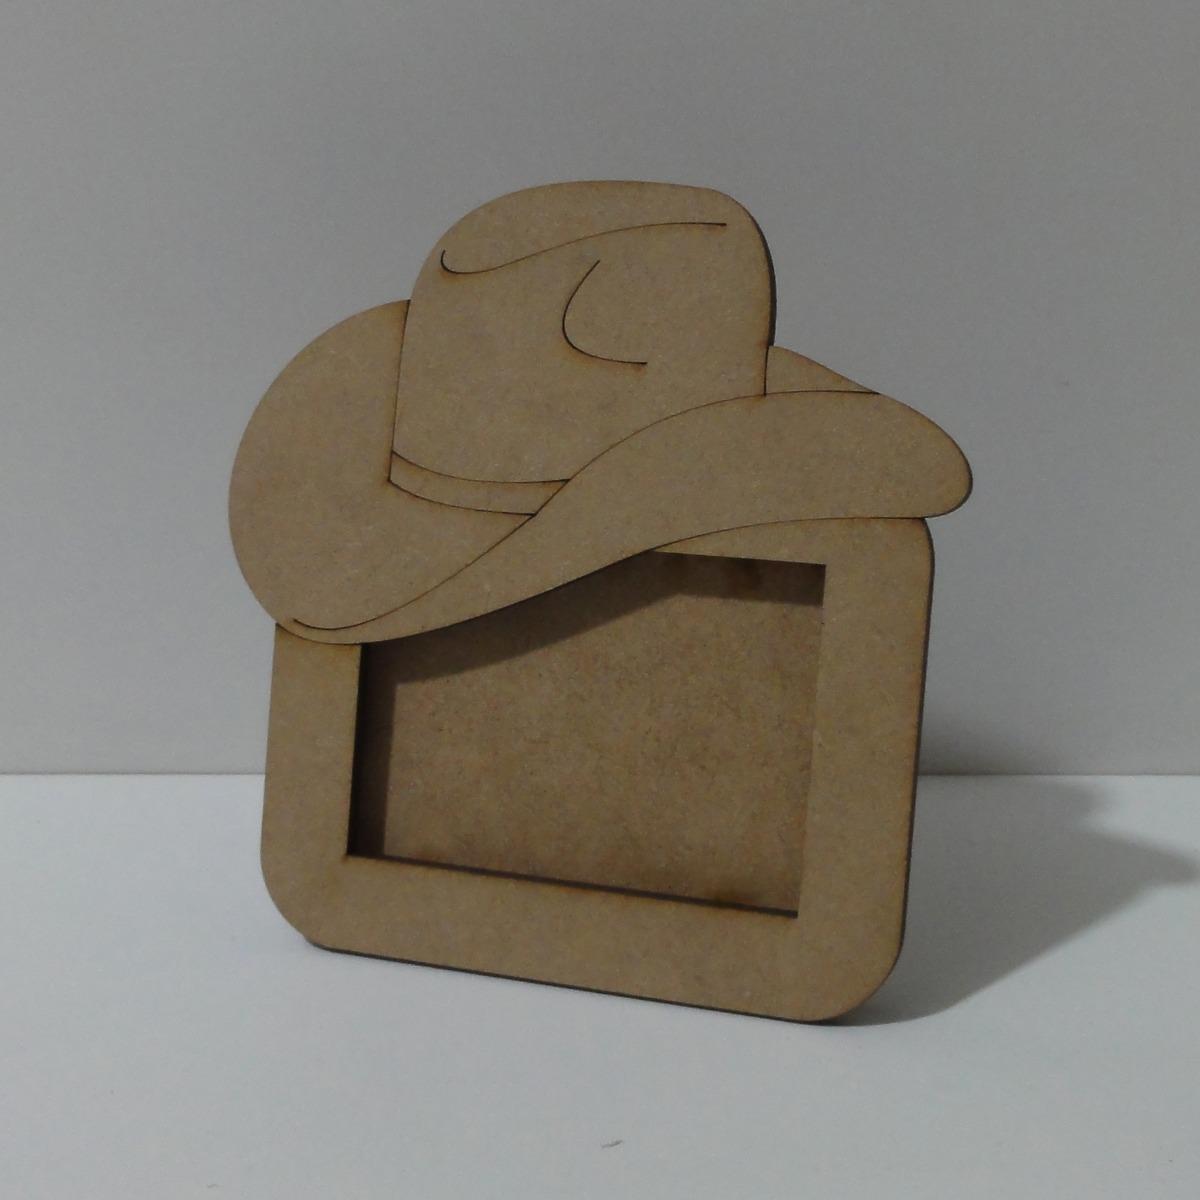 Portaretrato Sombrero Vaquero Cowboy Gorro Visera Invierno - $ 14,00 ...